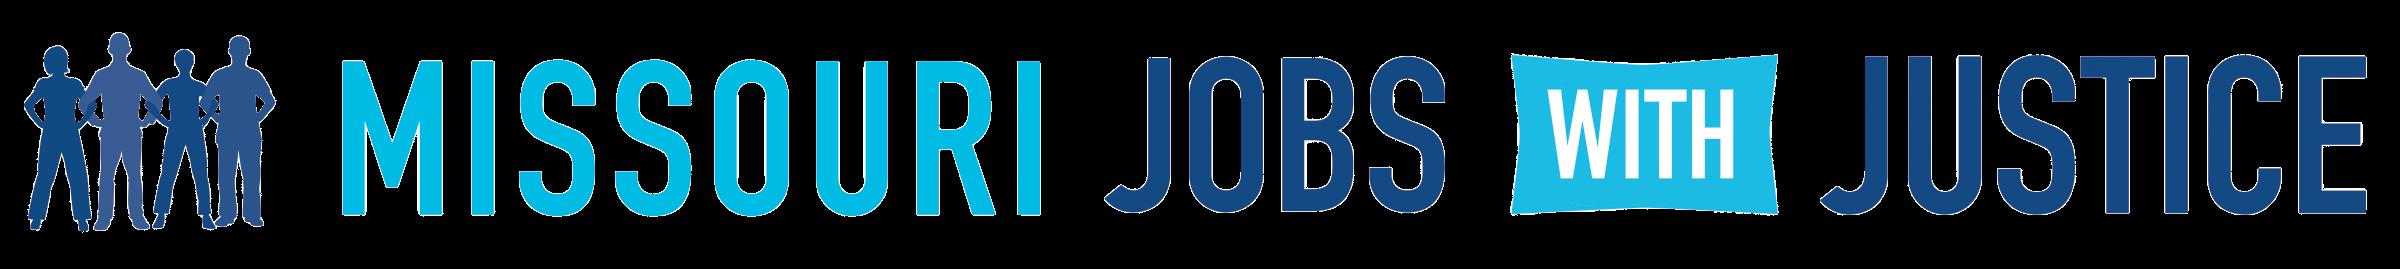 Missouri Jobs with Justice Logo